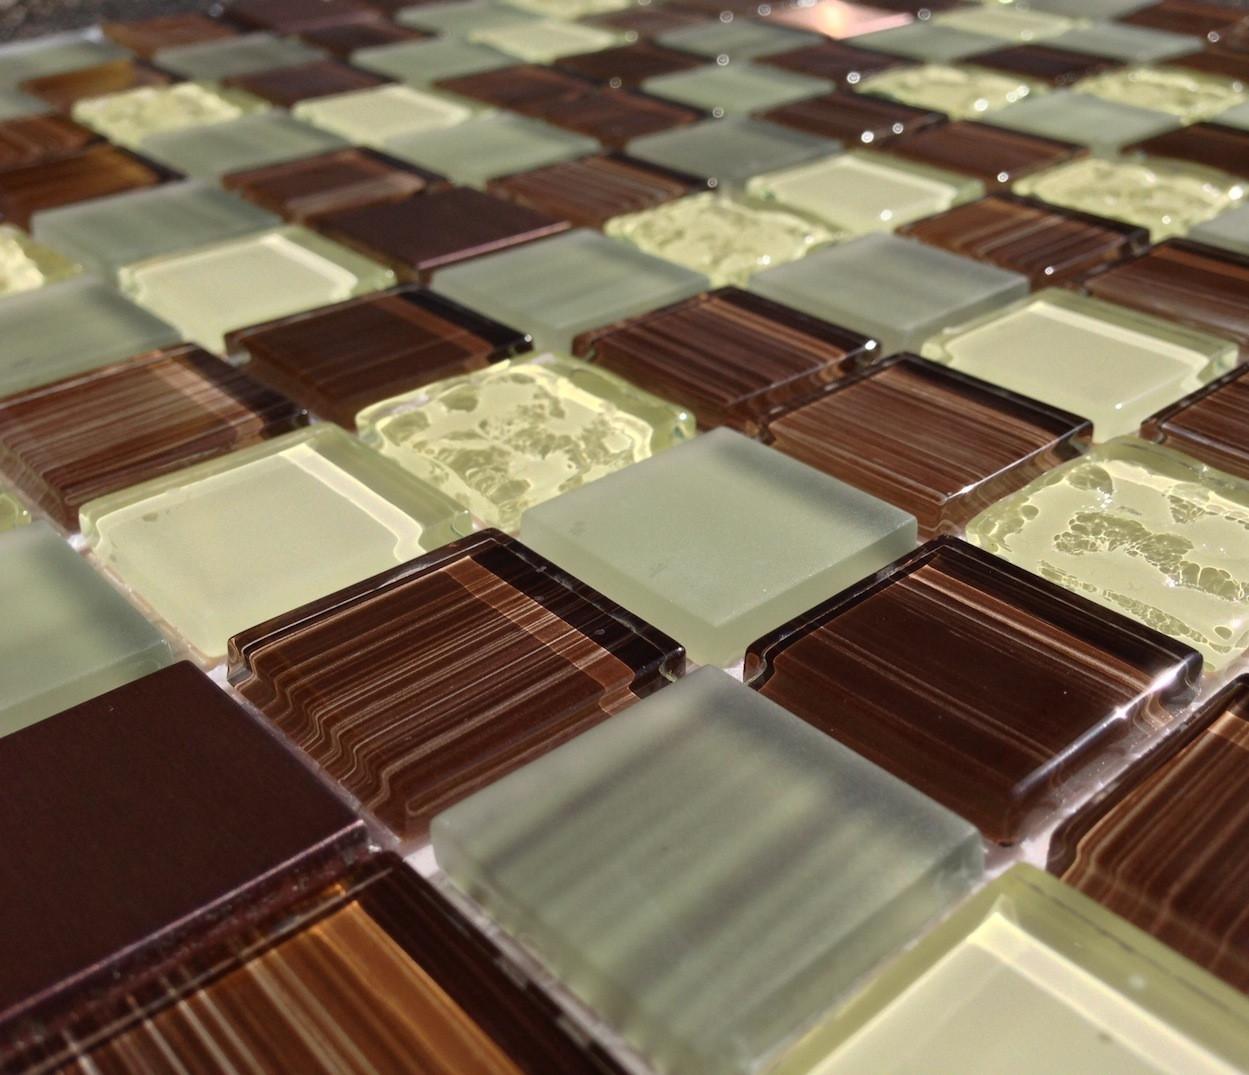 DIY Backsplash Kits  Mineral Tiles Launches Smaller Version of the DIY